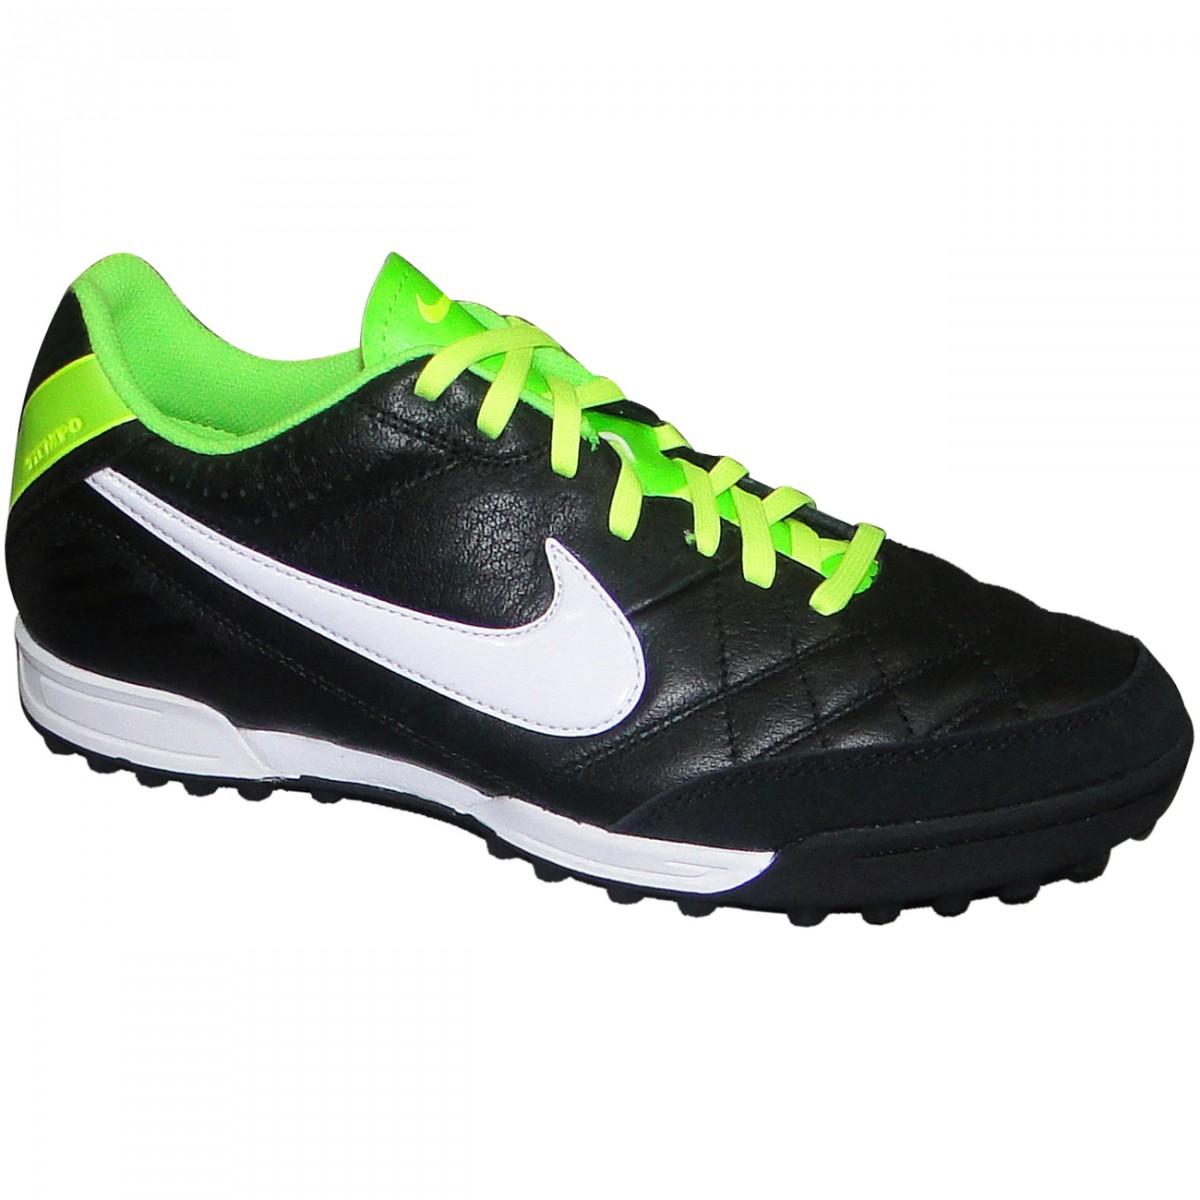 c03d853a81 Chuteira Society Nike Tiempo Natural Iv 509089-013 - Preto Limão - Chuteira  Nike